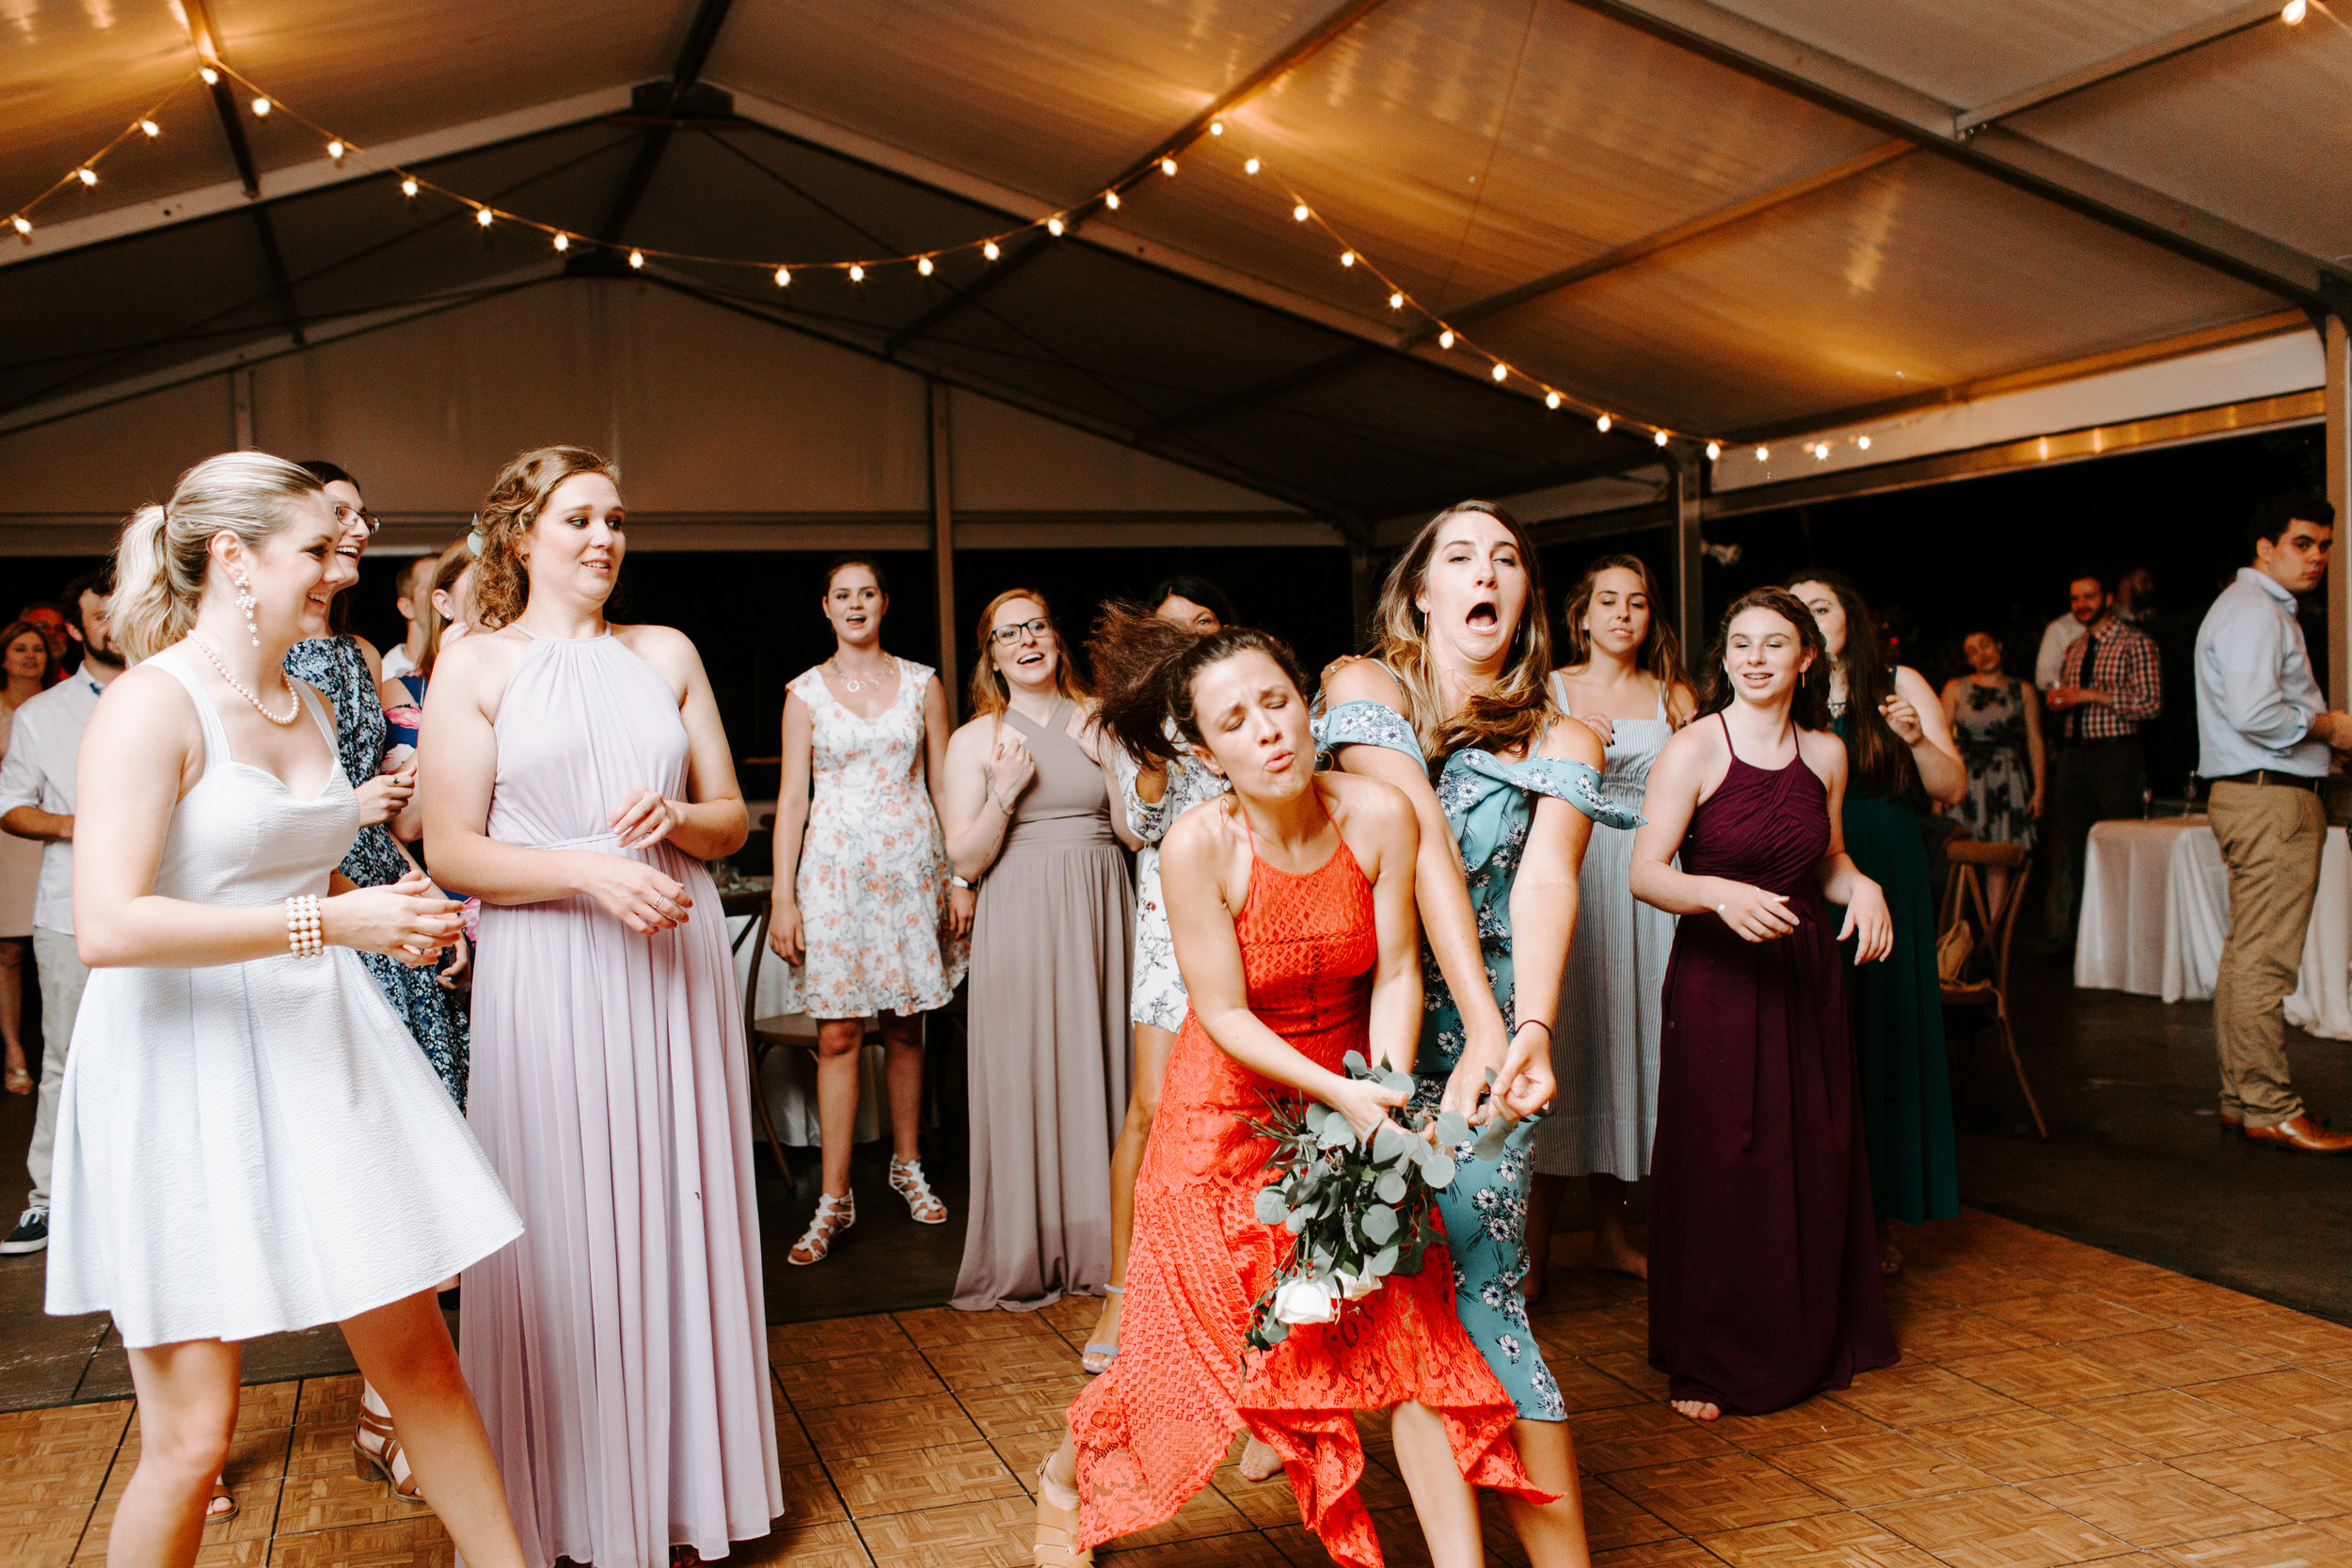 knoxville-wedding-photographer-243.JPG